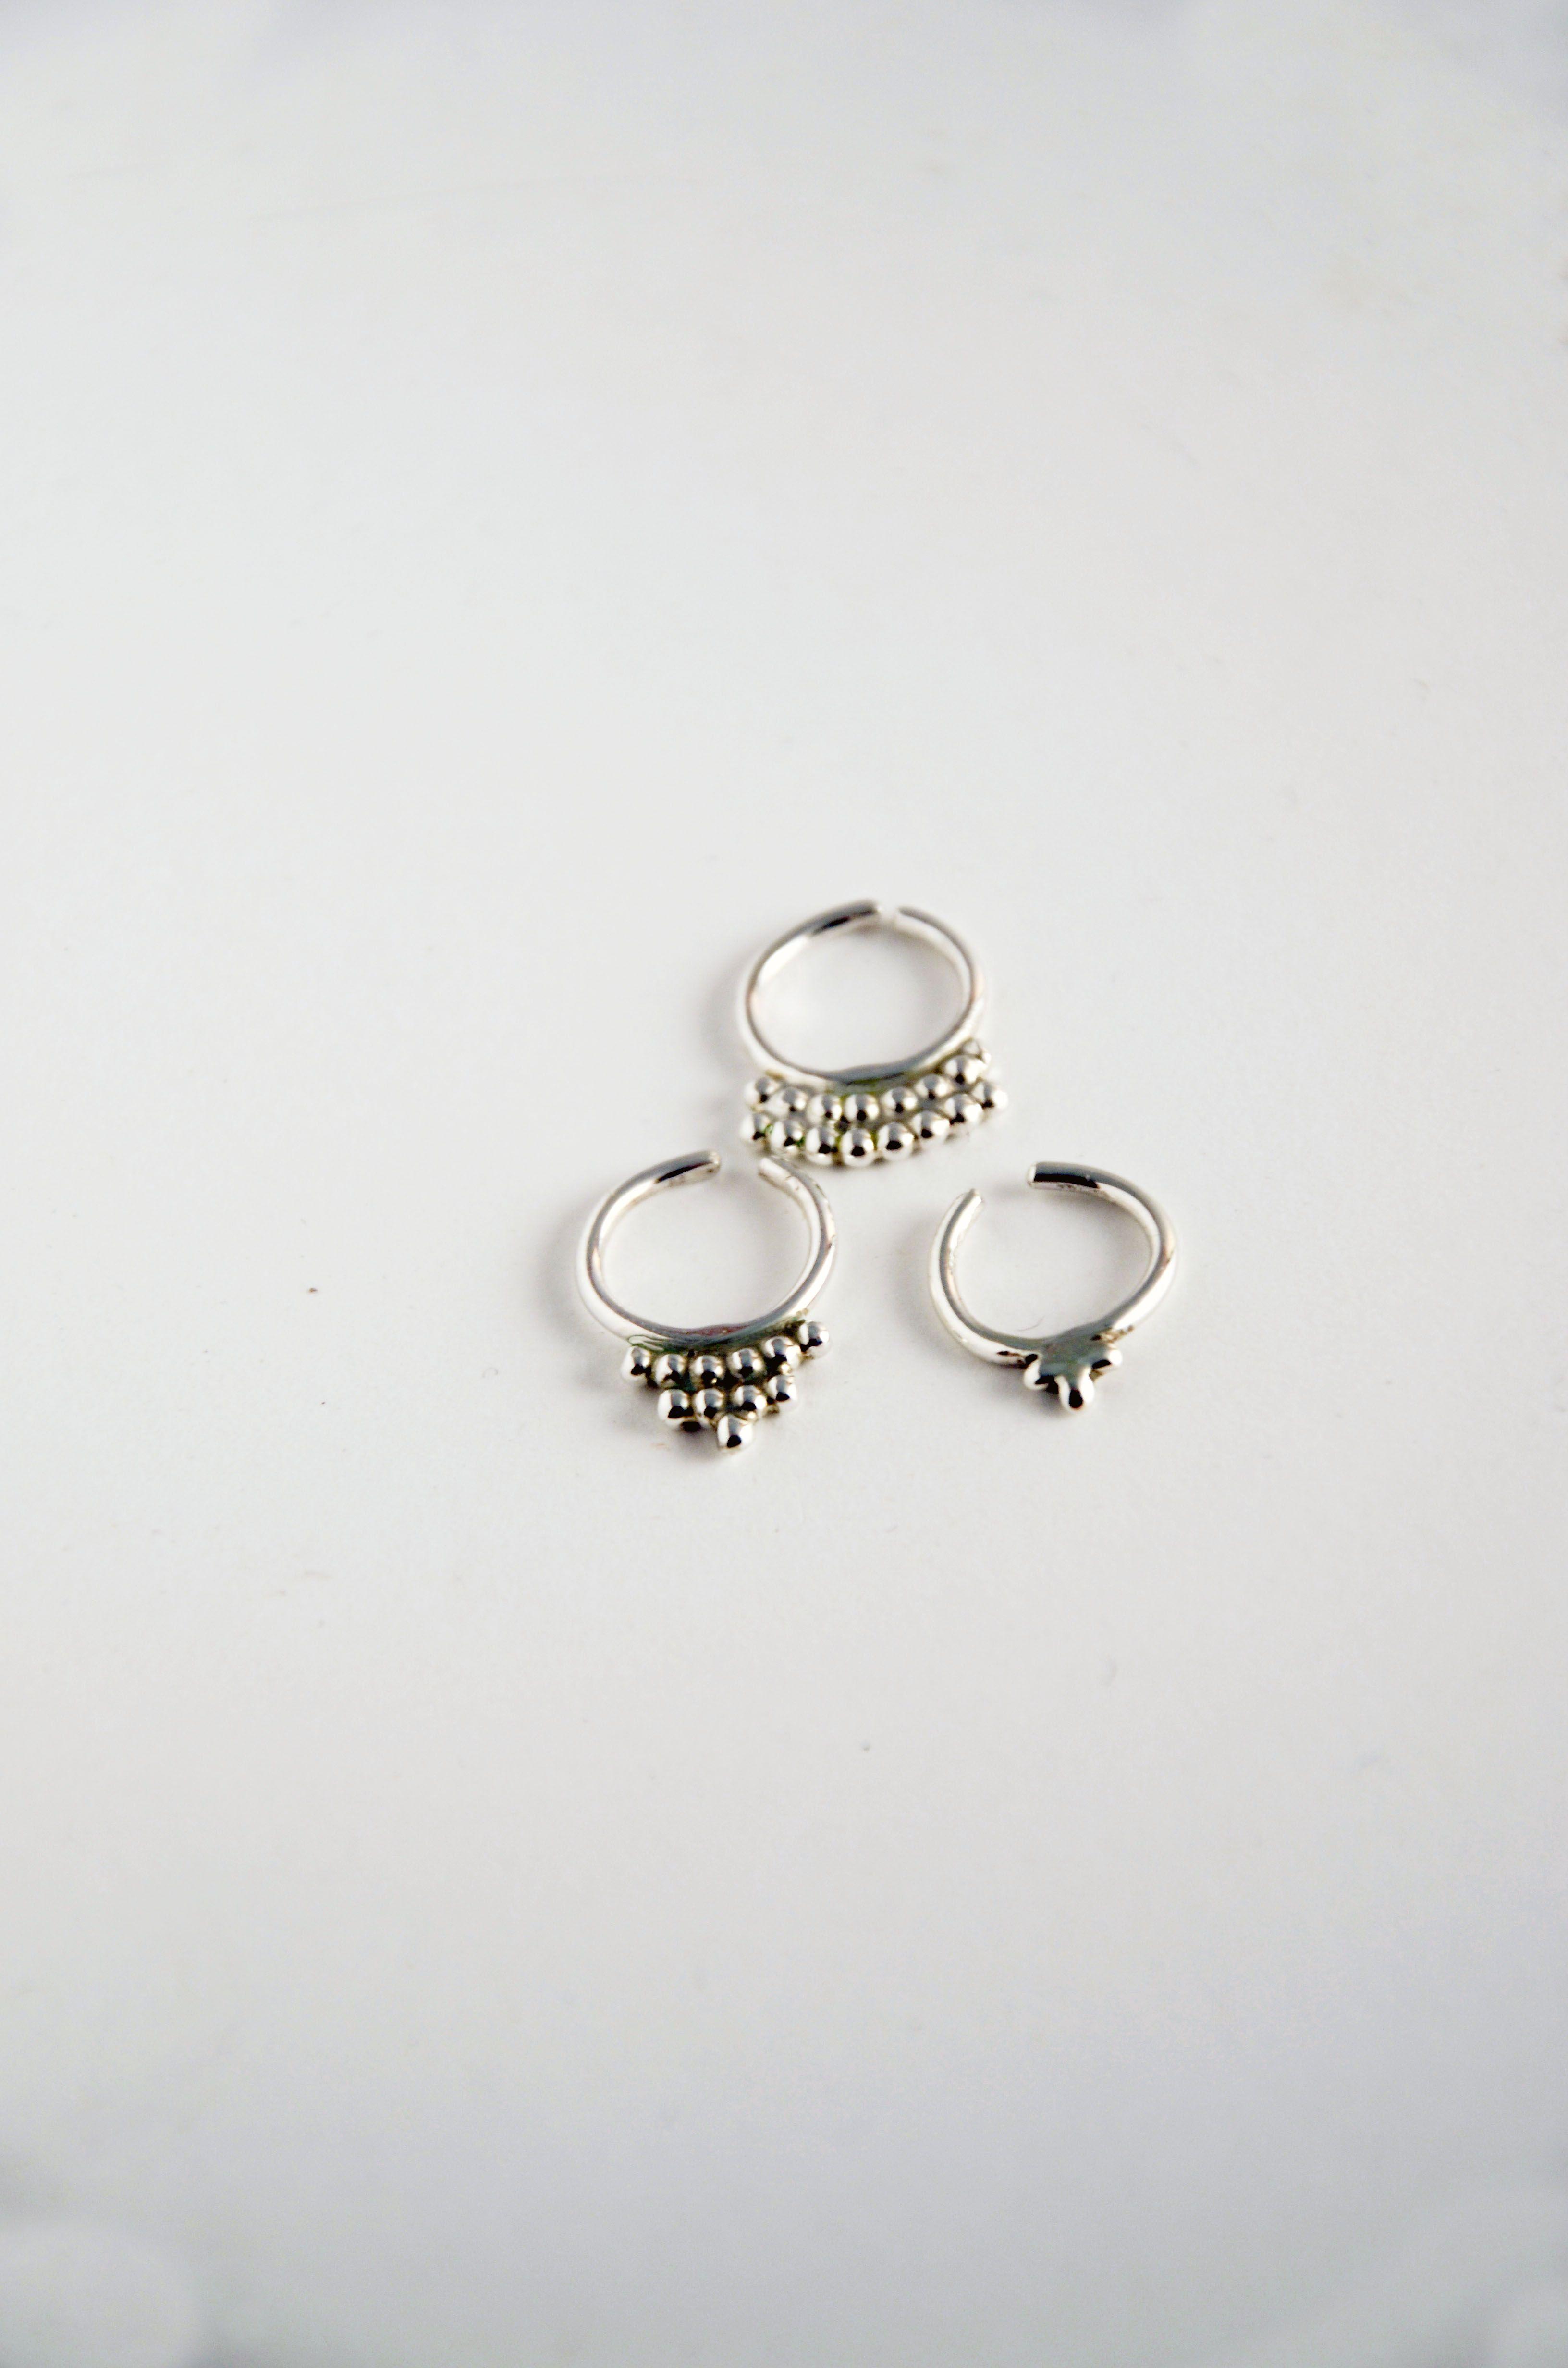 Septum piercing vs nose piercing  Silver septum piercing  Jewels  Pinterest  Septum and Piercing